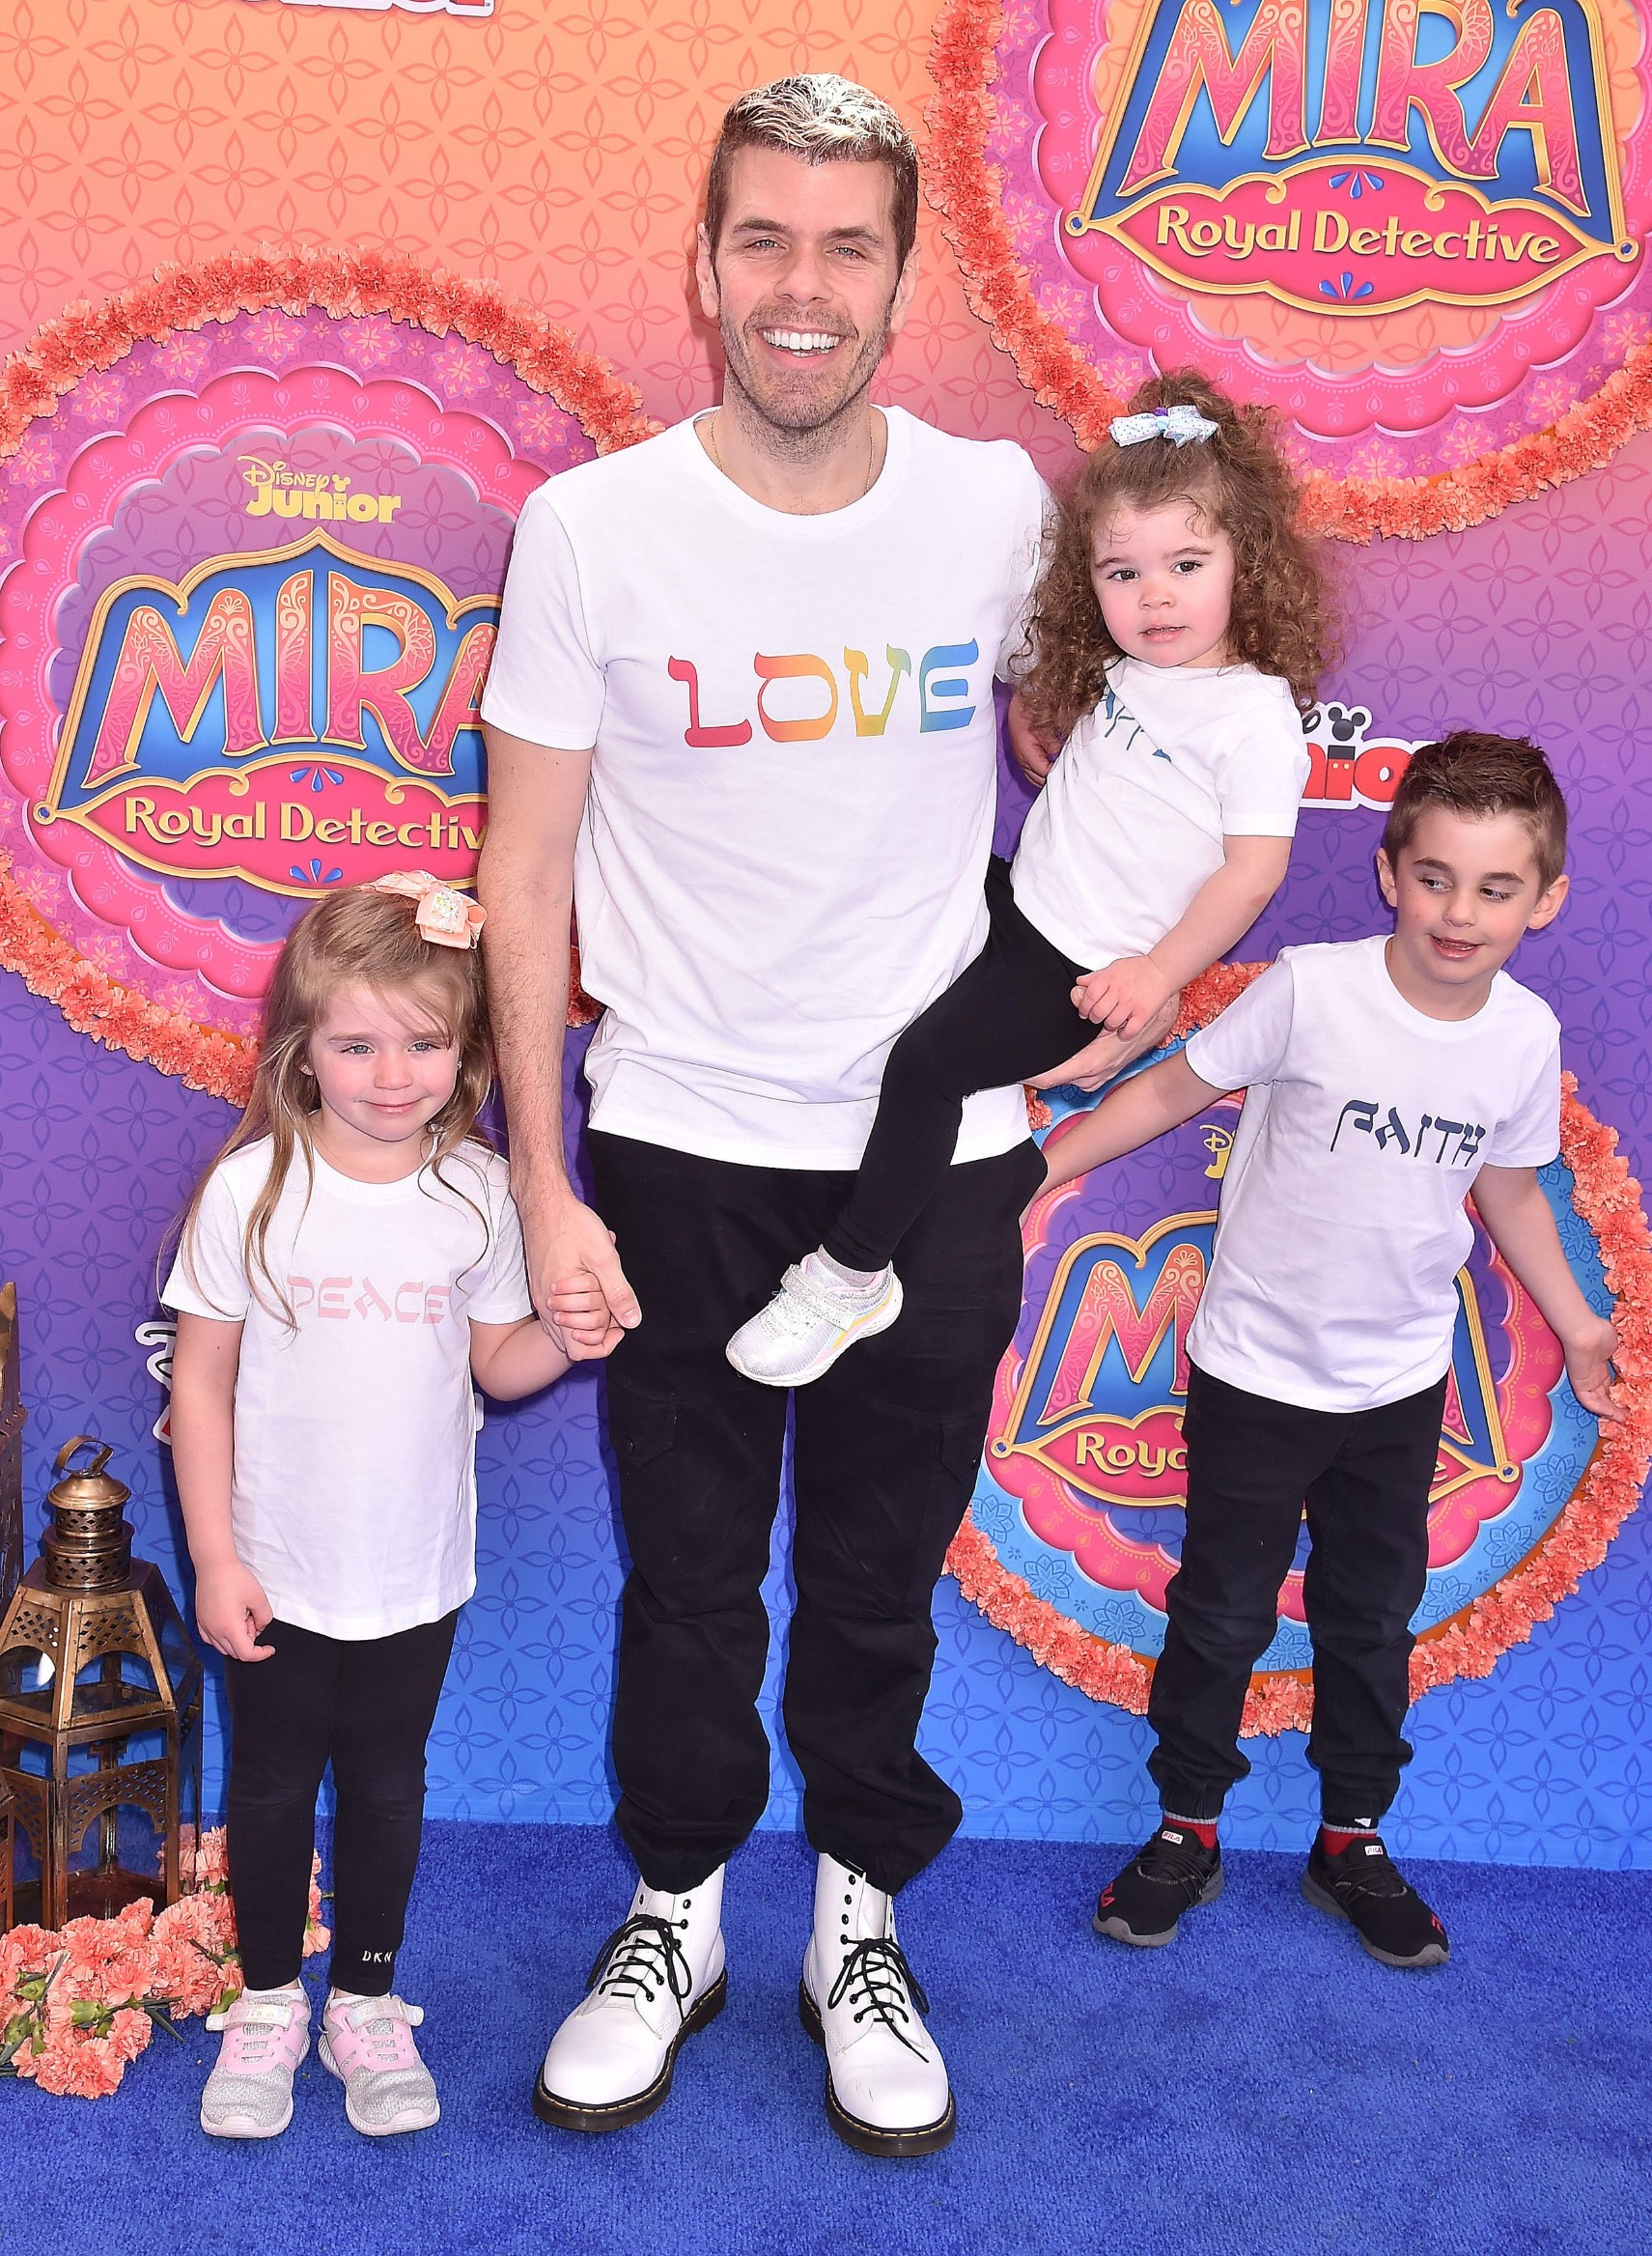 BURBANK, CA - MARCH 07: Perez Hilton and family attend the premiere of Disney Junior's